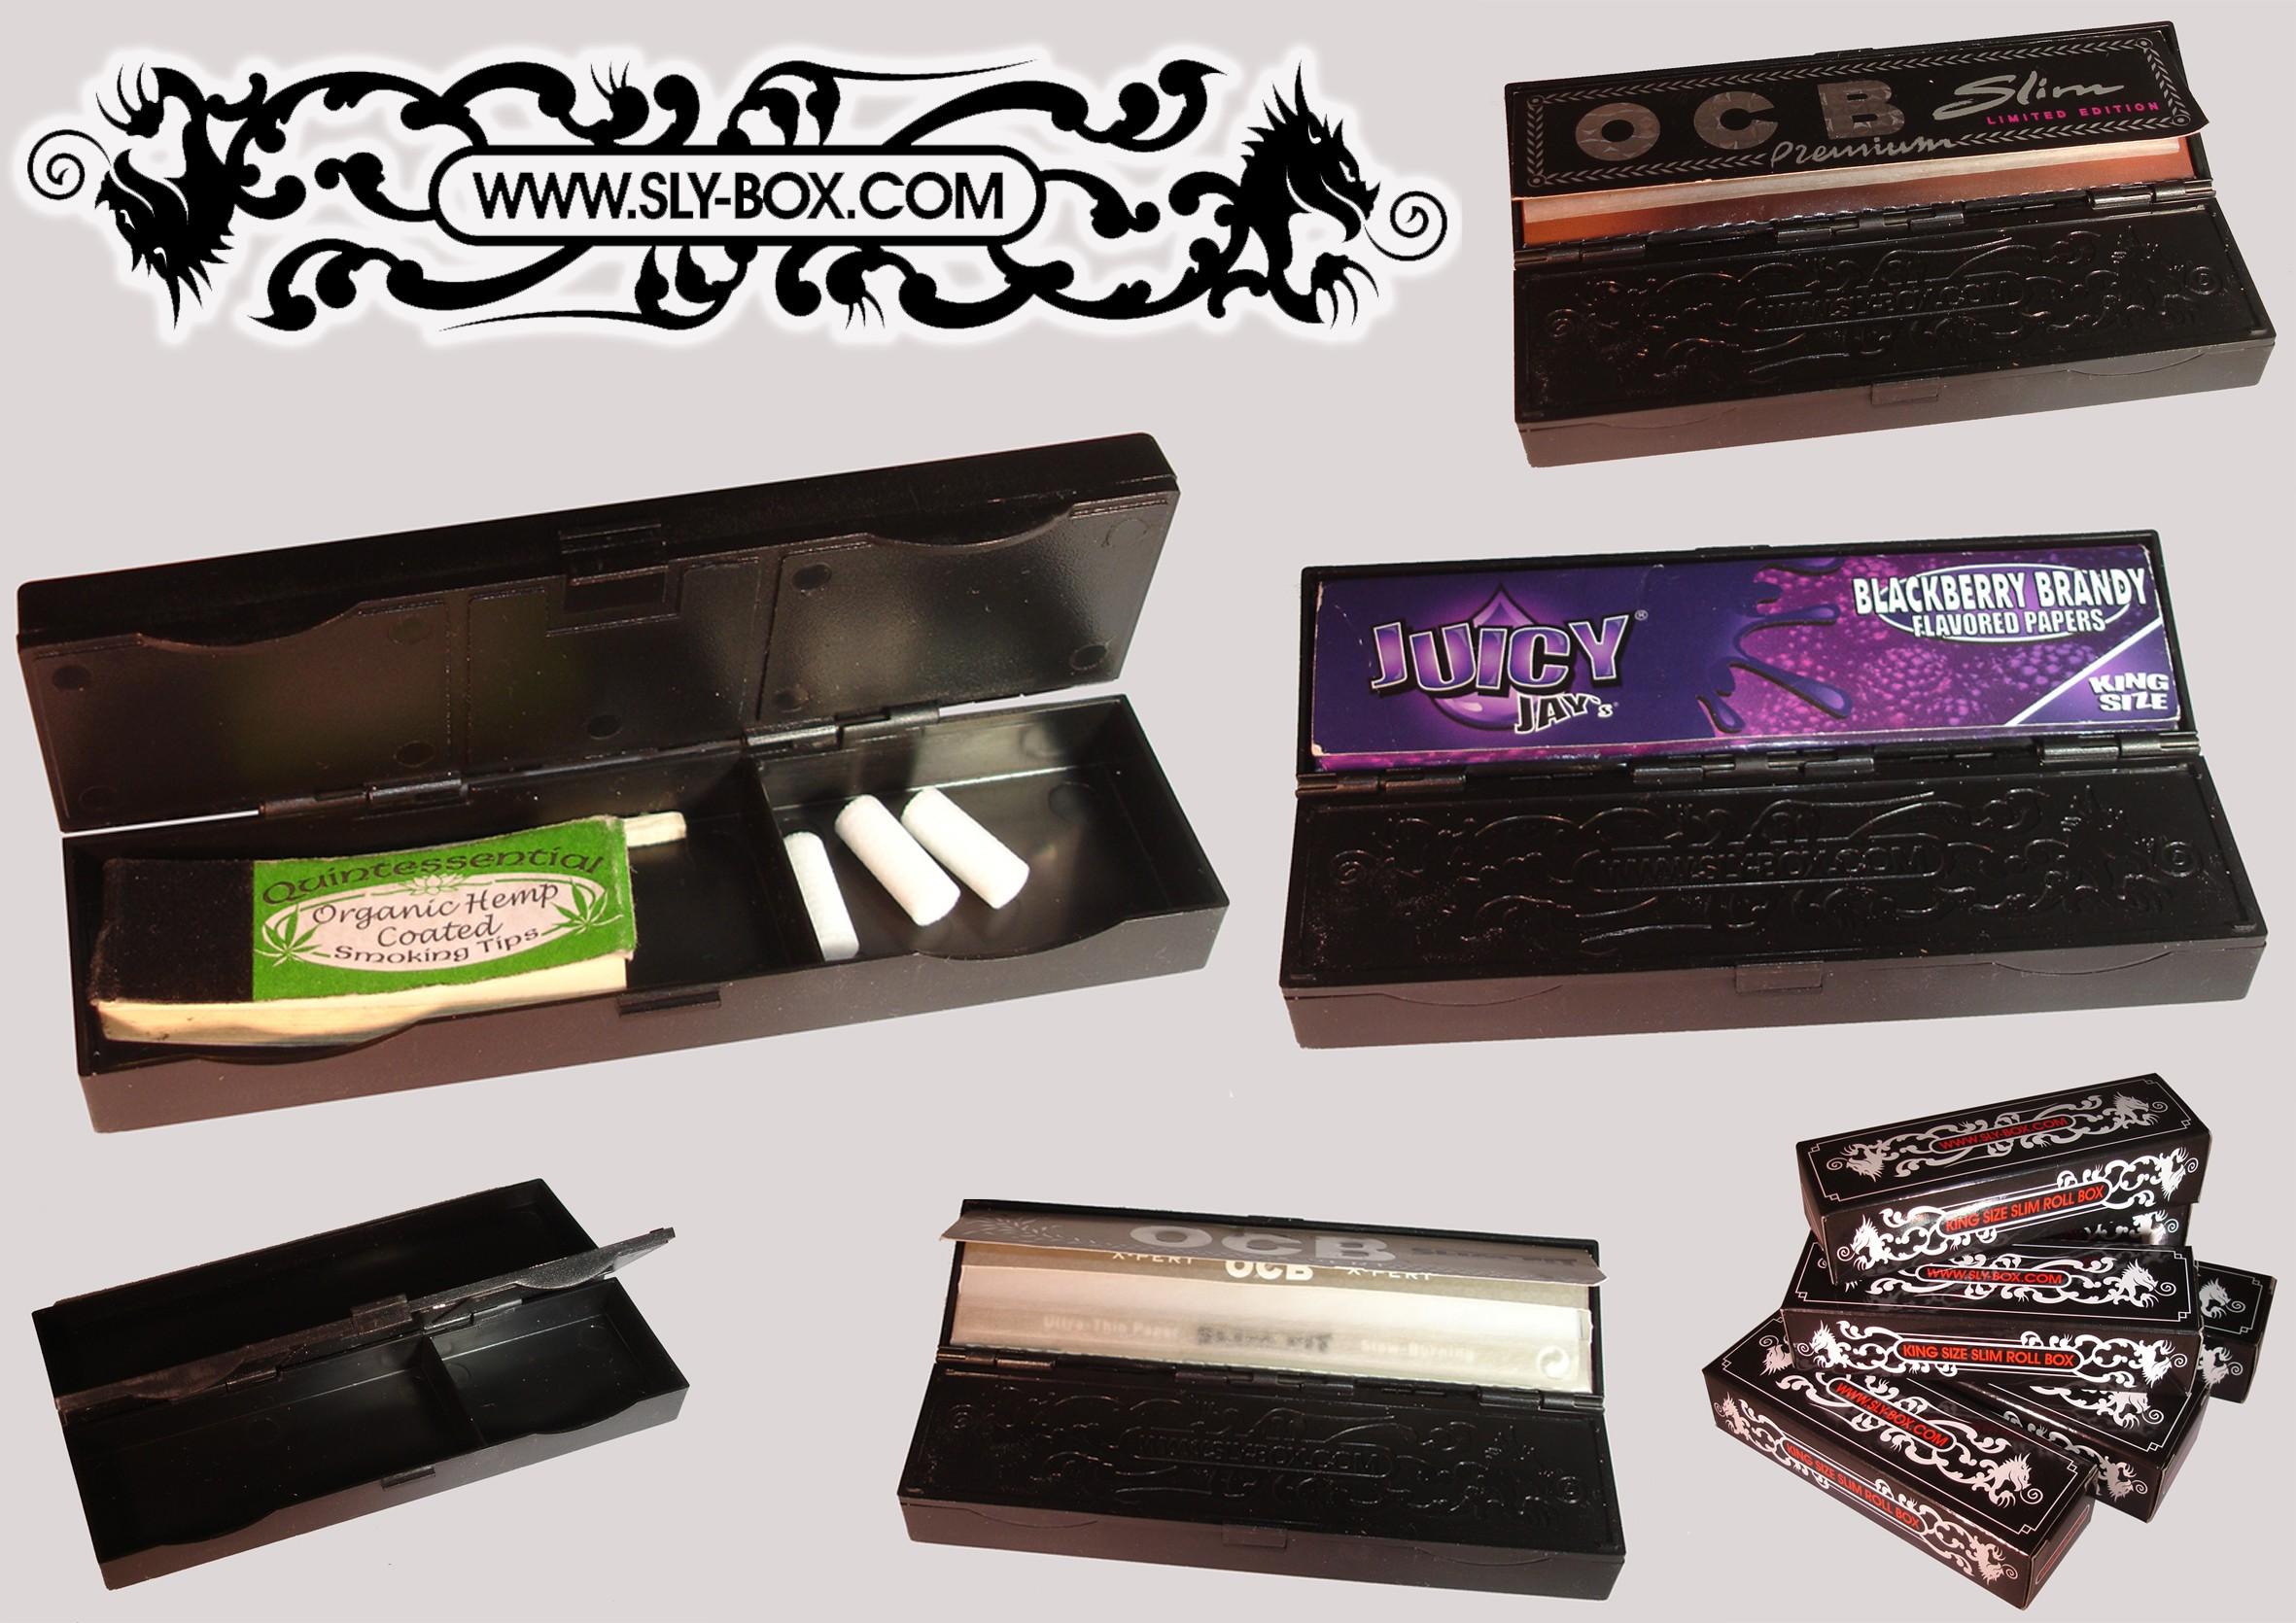 SLYBOX - King Size Slim Roll Box